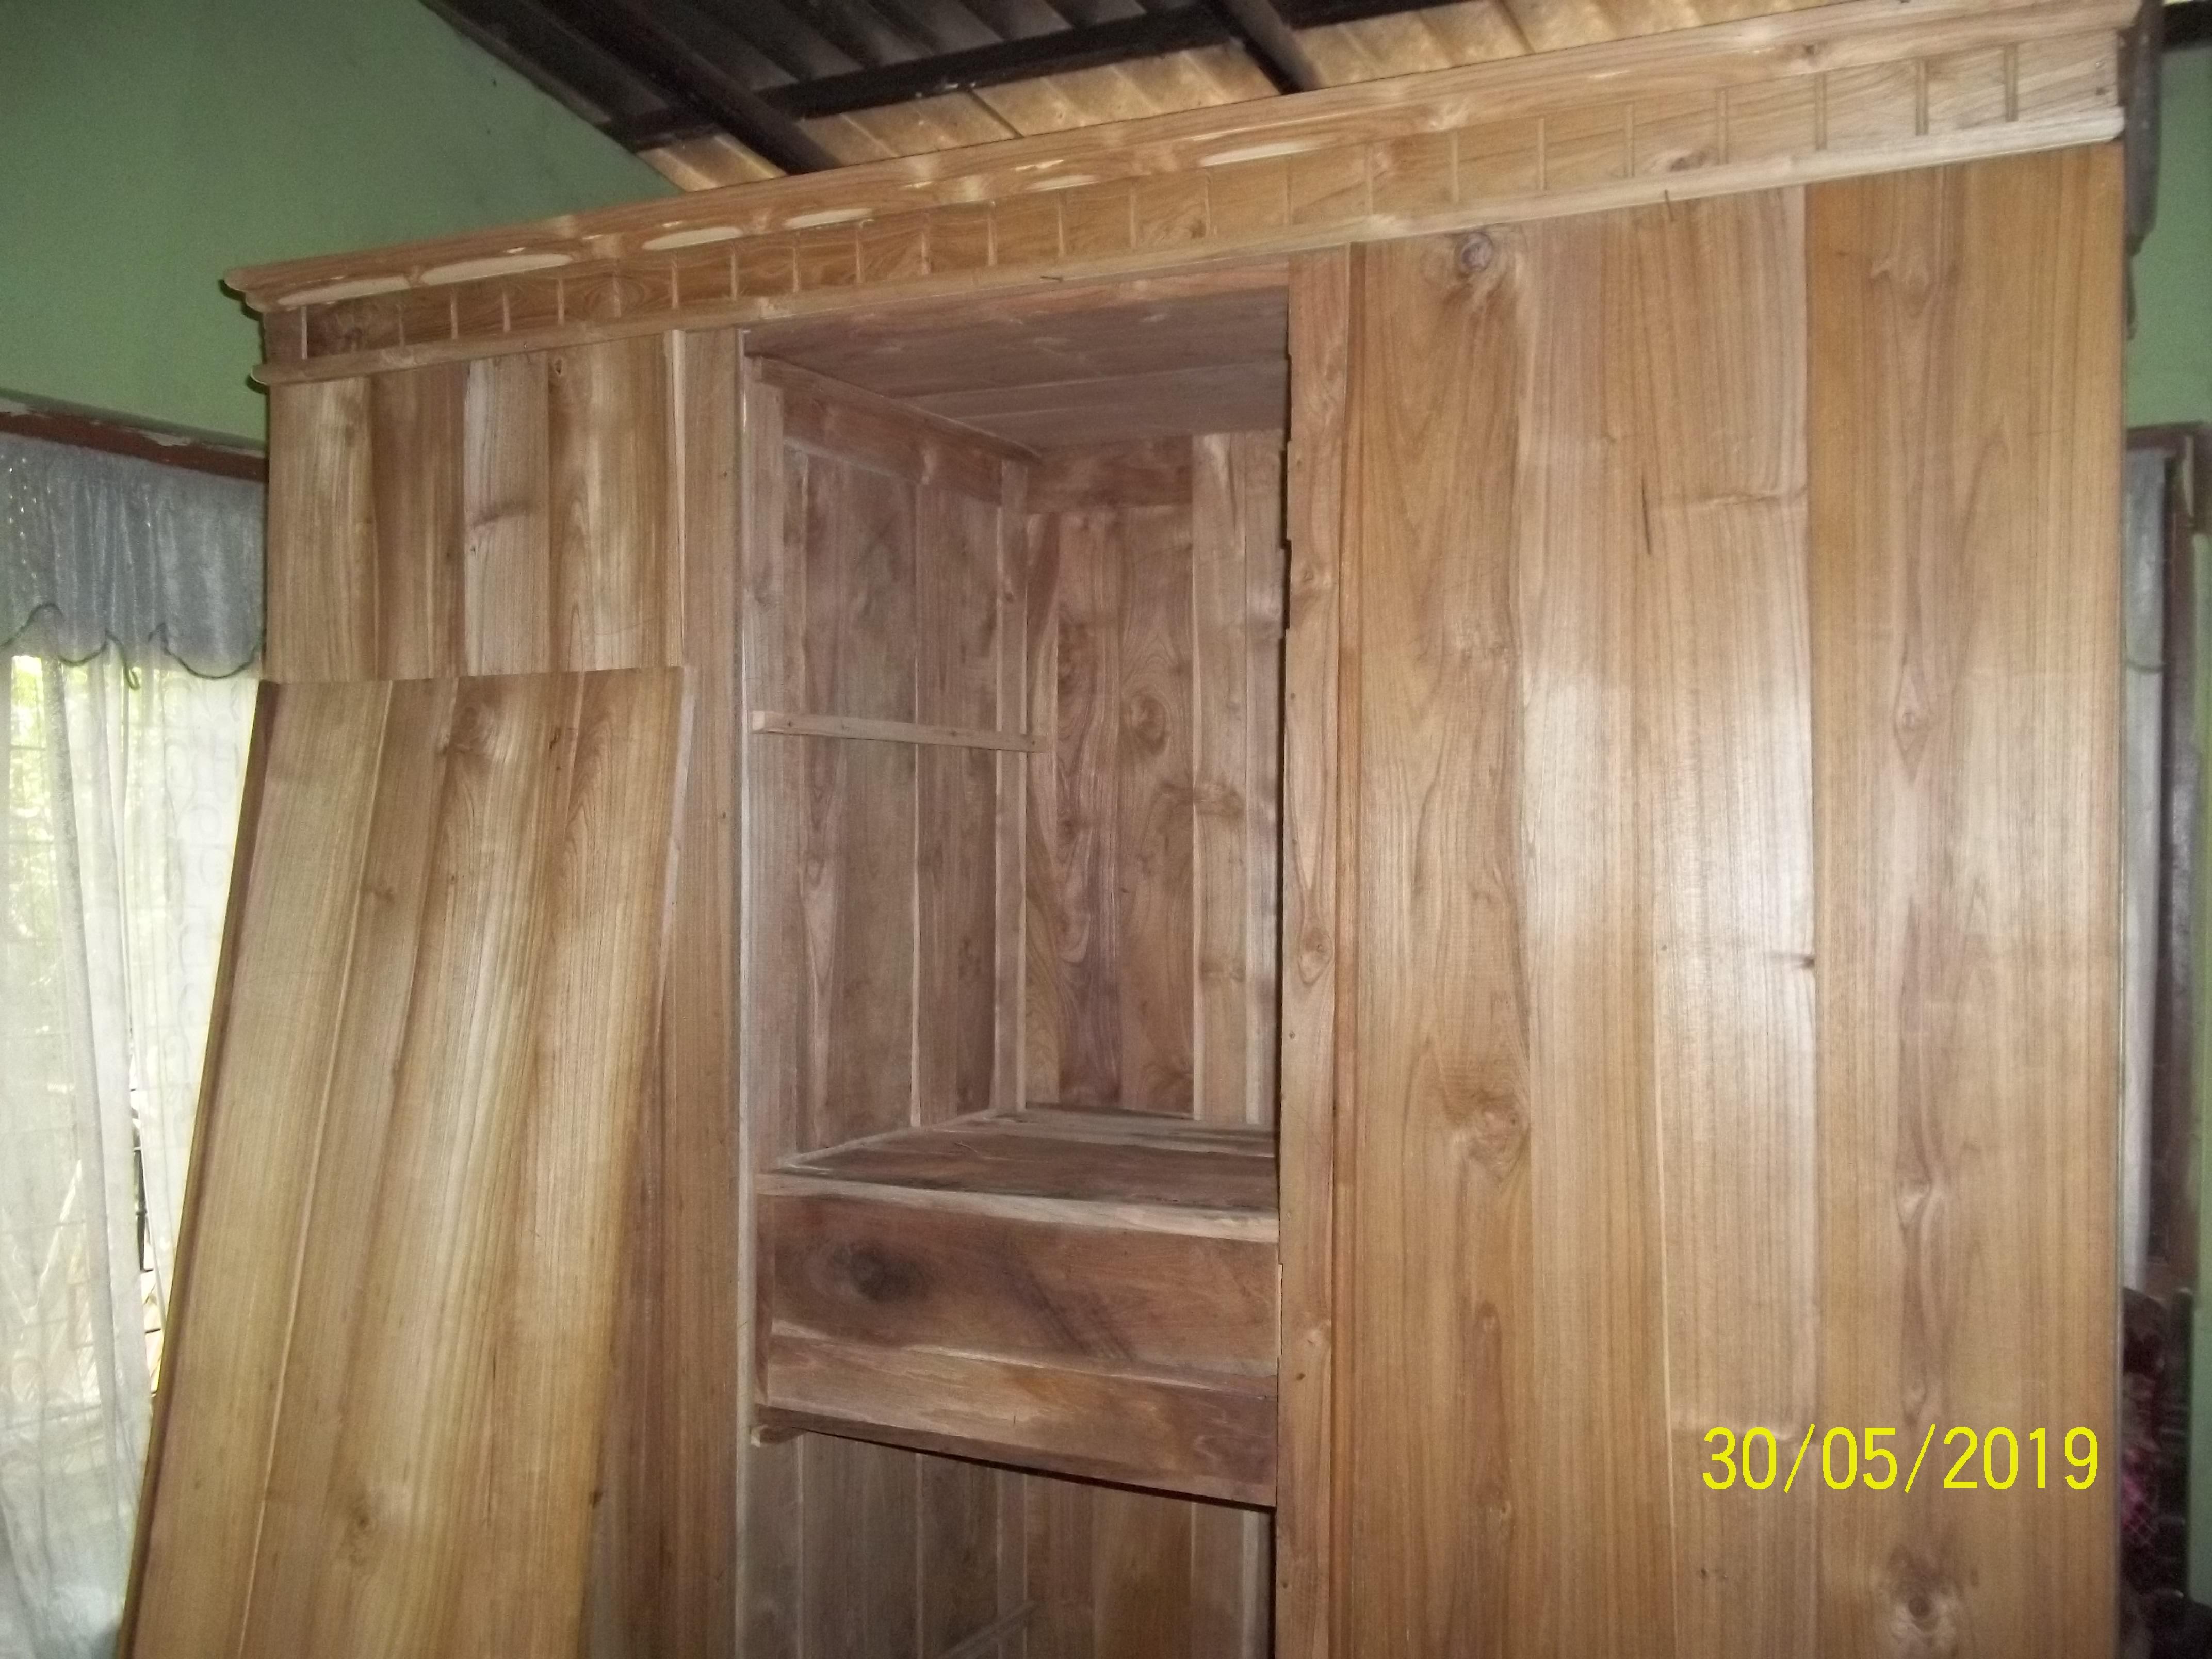 Teak Almirahs Dressing Tables Beds From Moratuwa Sl